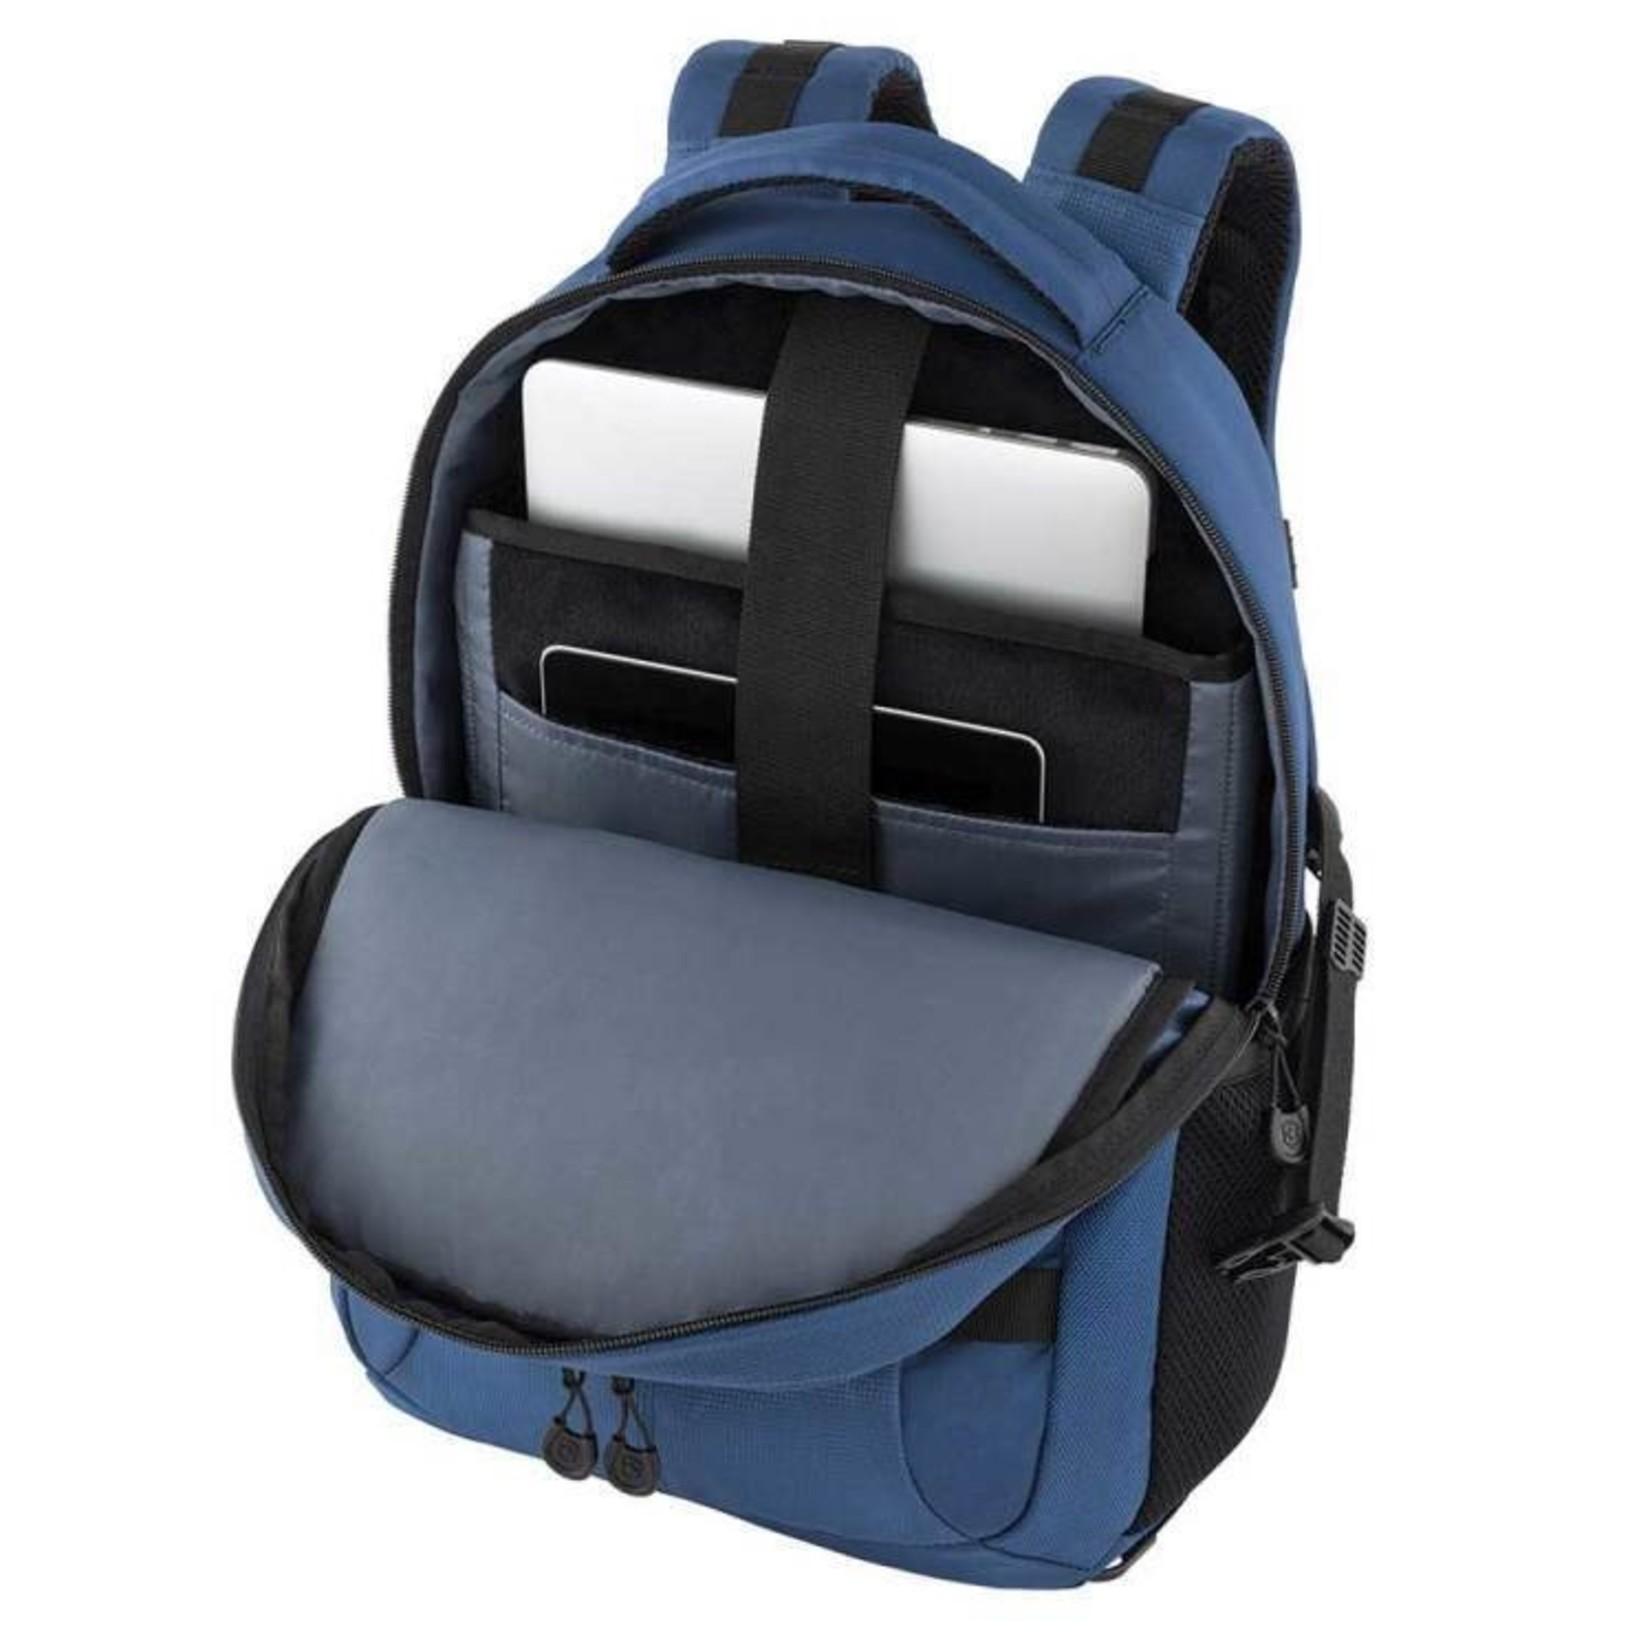 Victorinox Victorinox Sport Cadet rugzak Blauw